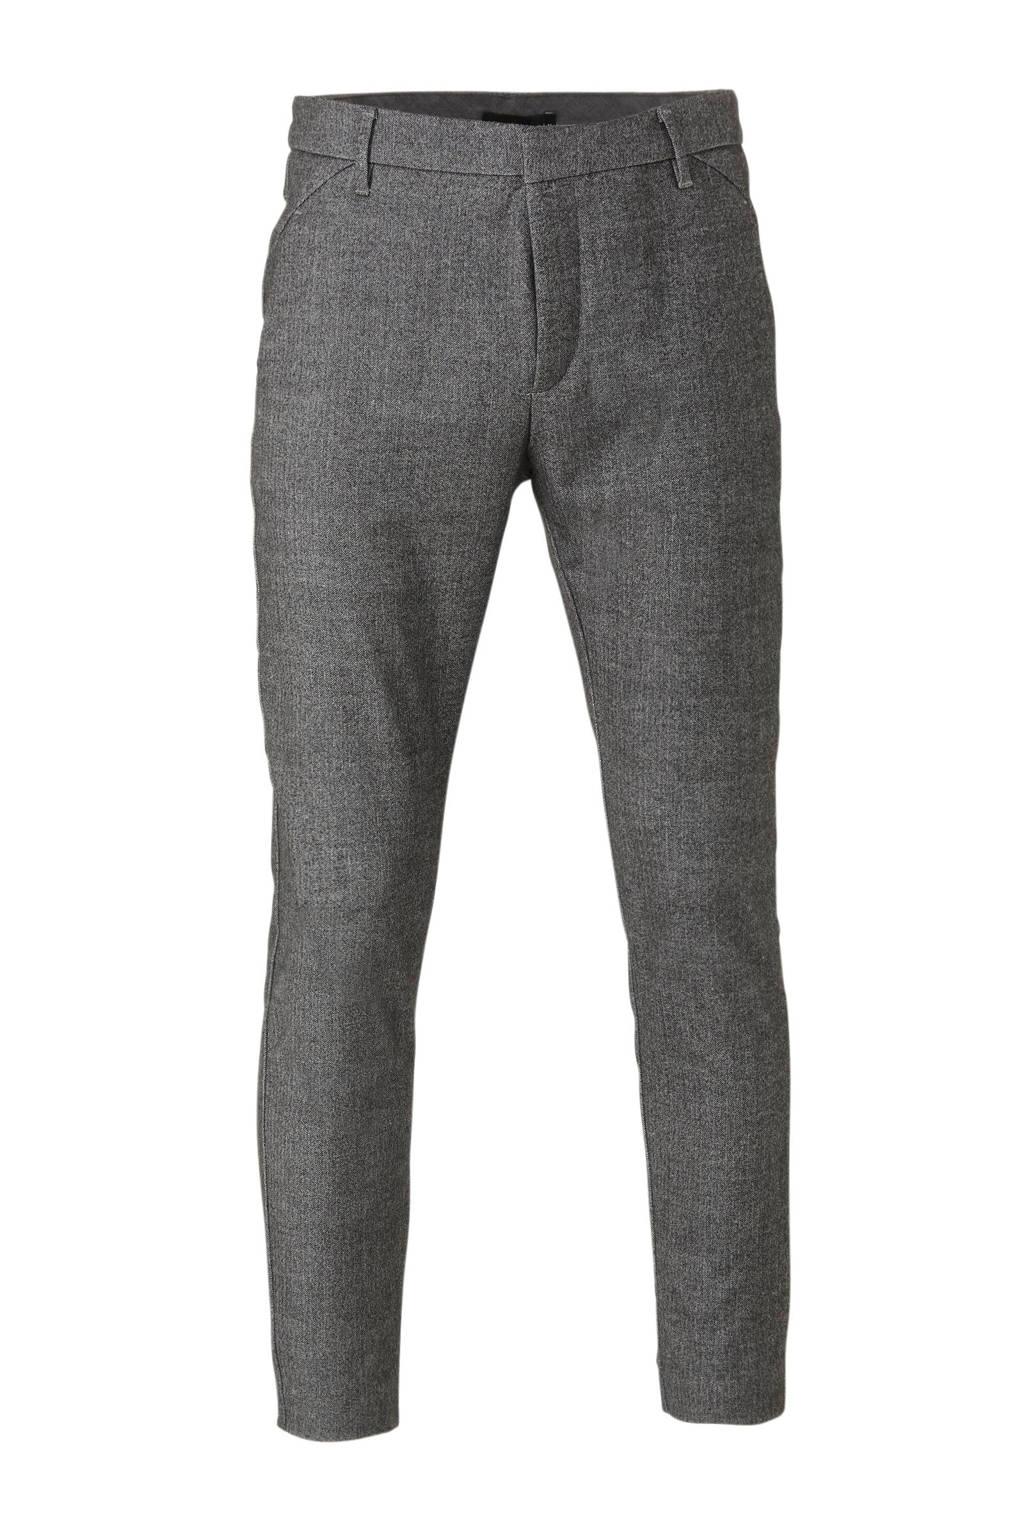 PLAIN slim fit pantalon grijs, Grijs